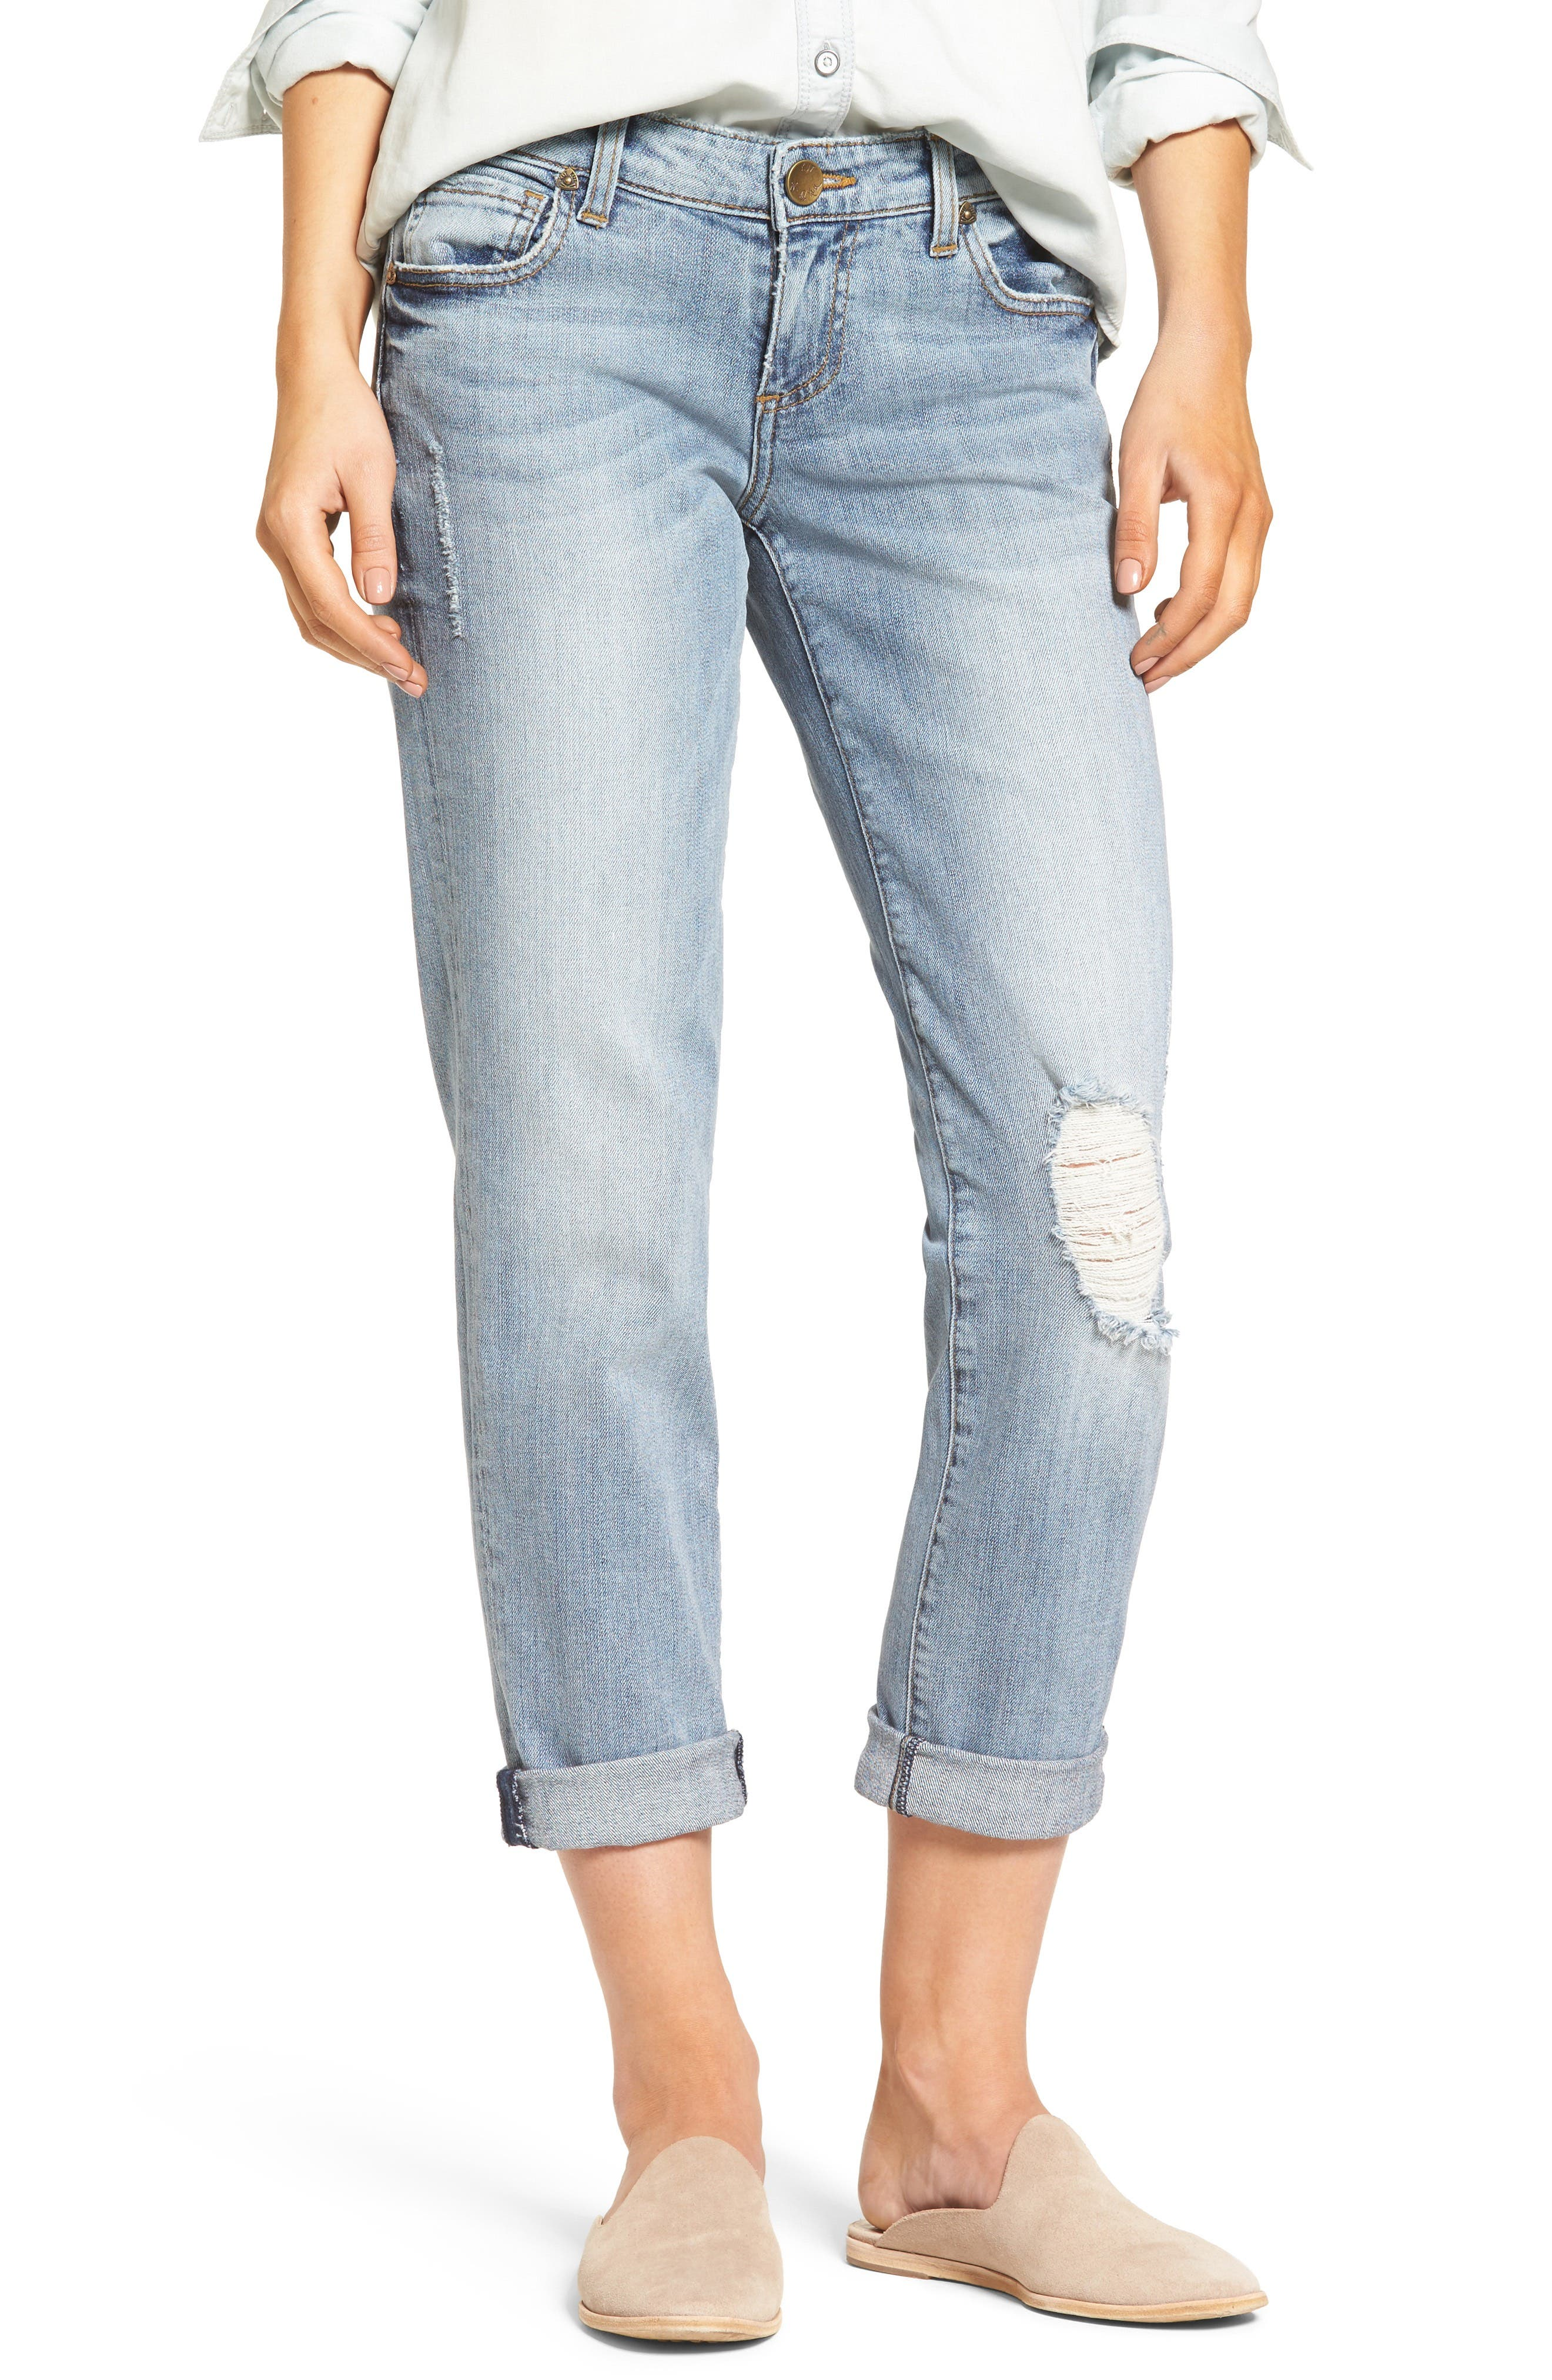 Catherine Distressed Boyfriend Jeans,                         Main,                         color, Regarded